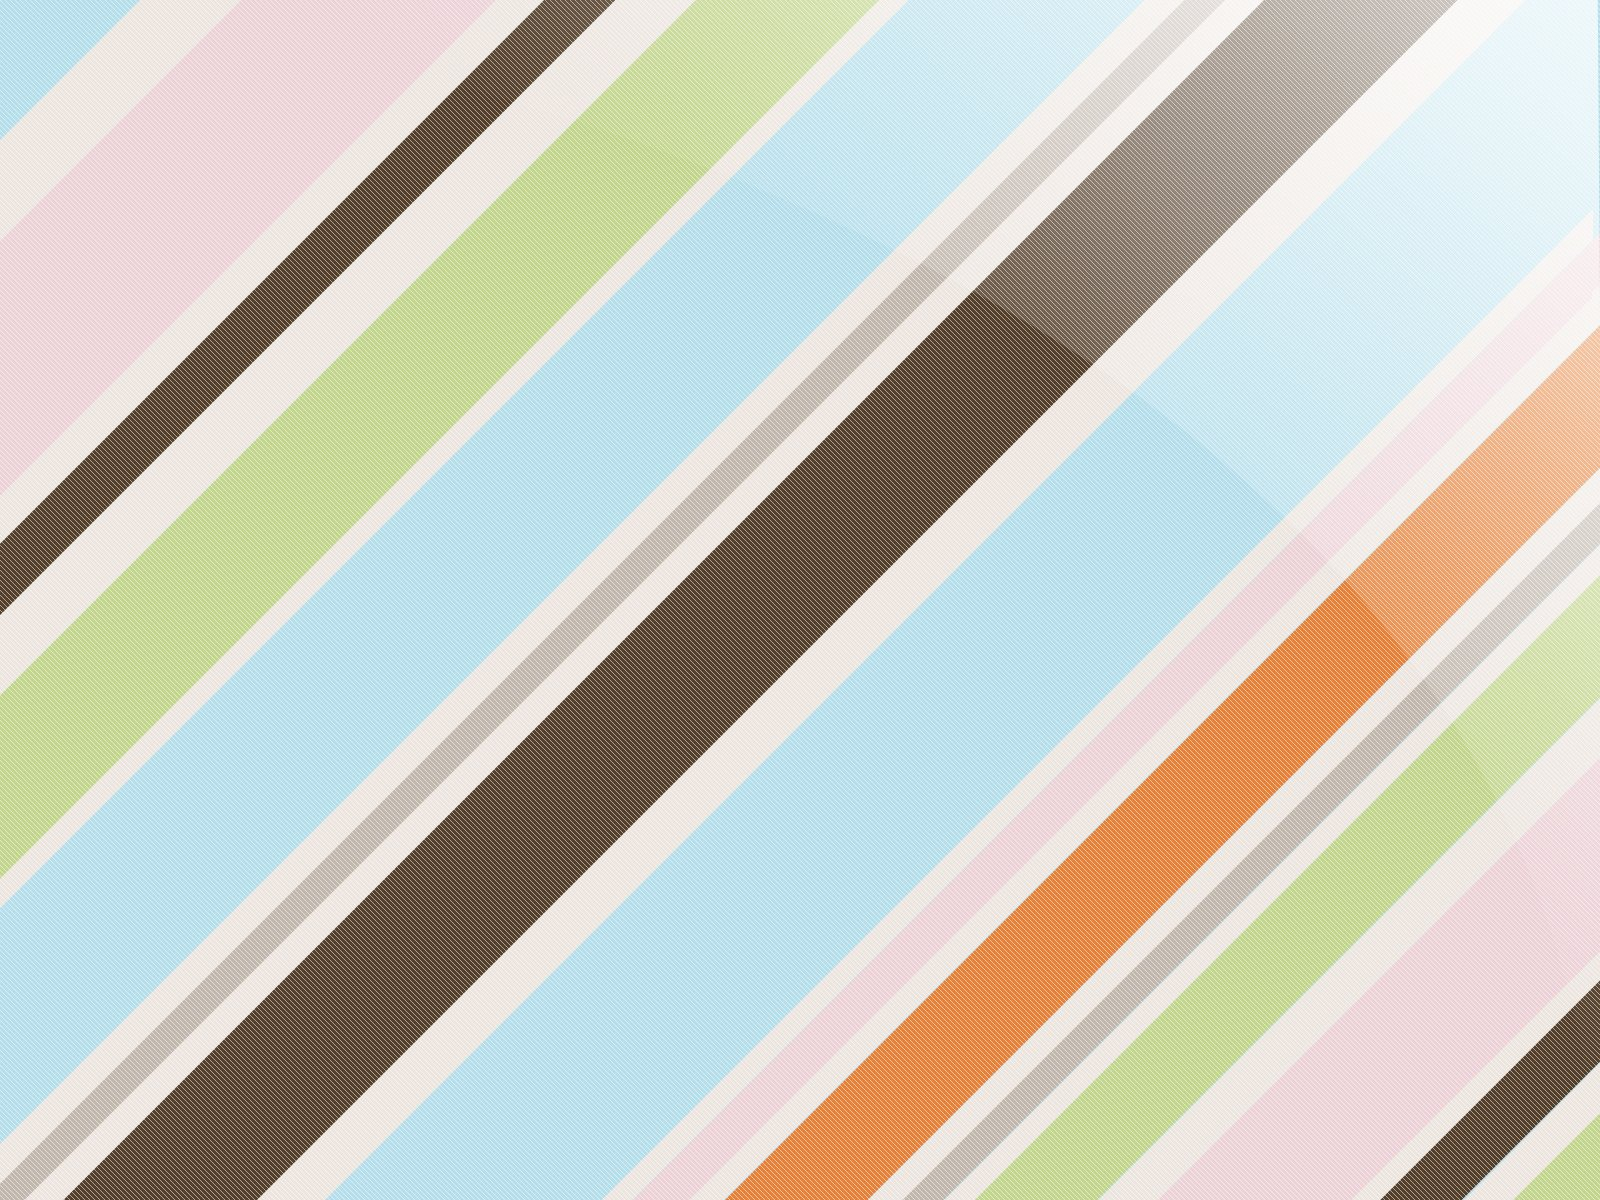 Patrón - Abstracto  Colores Fondo de Pantalla